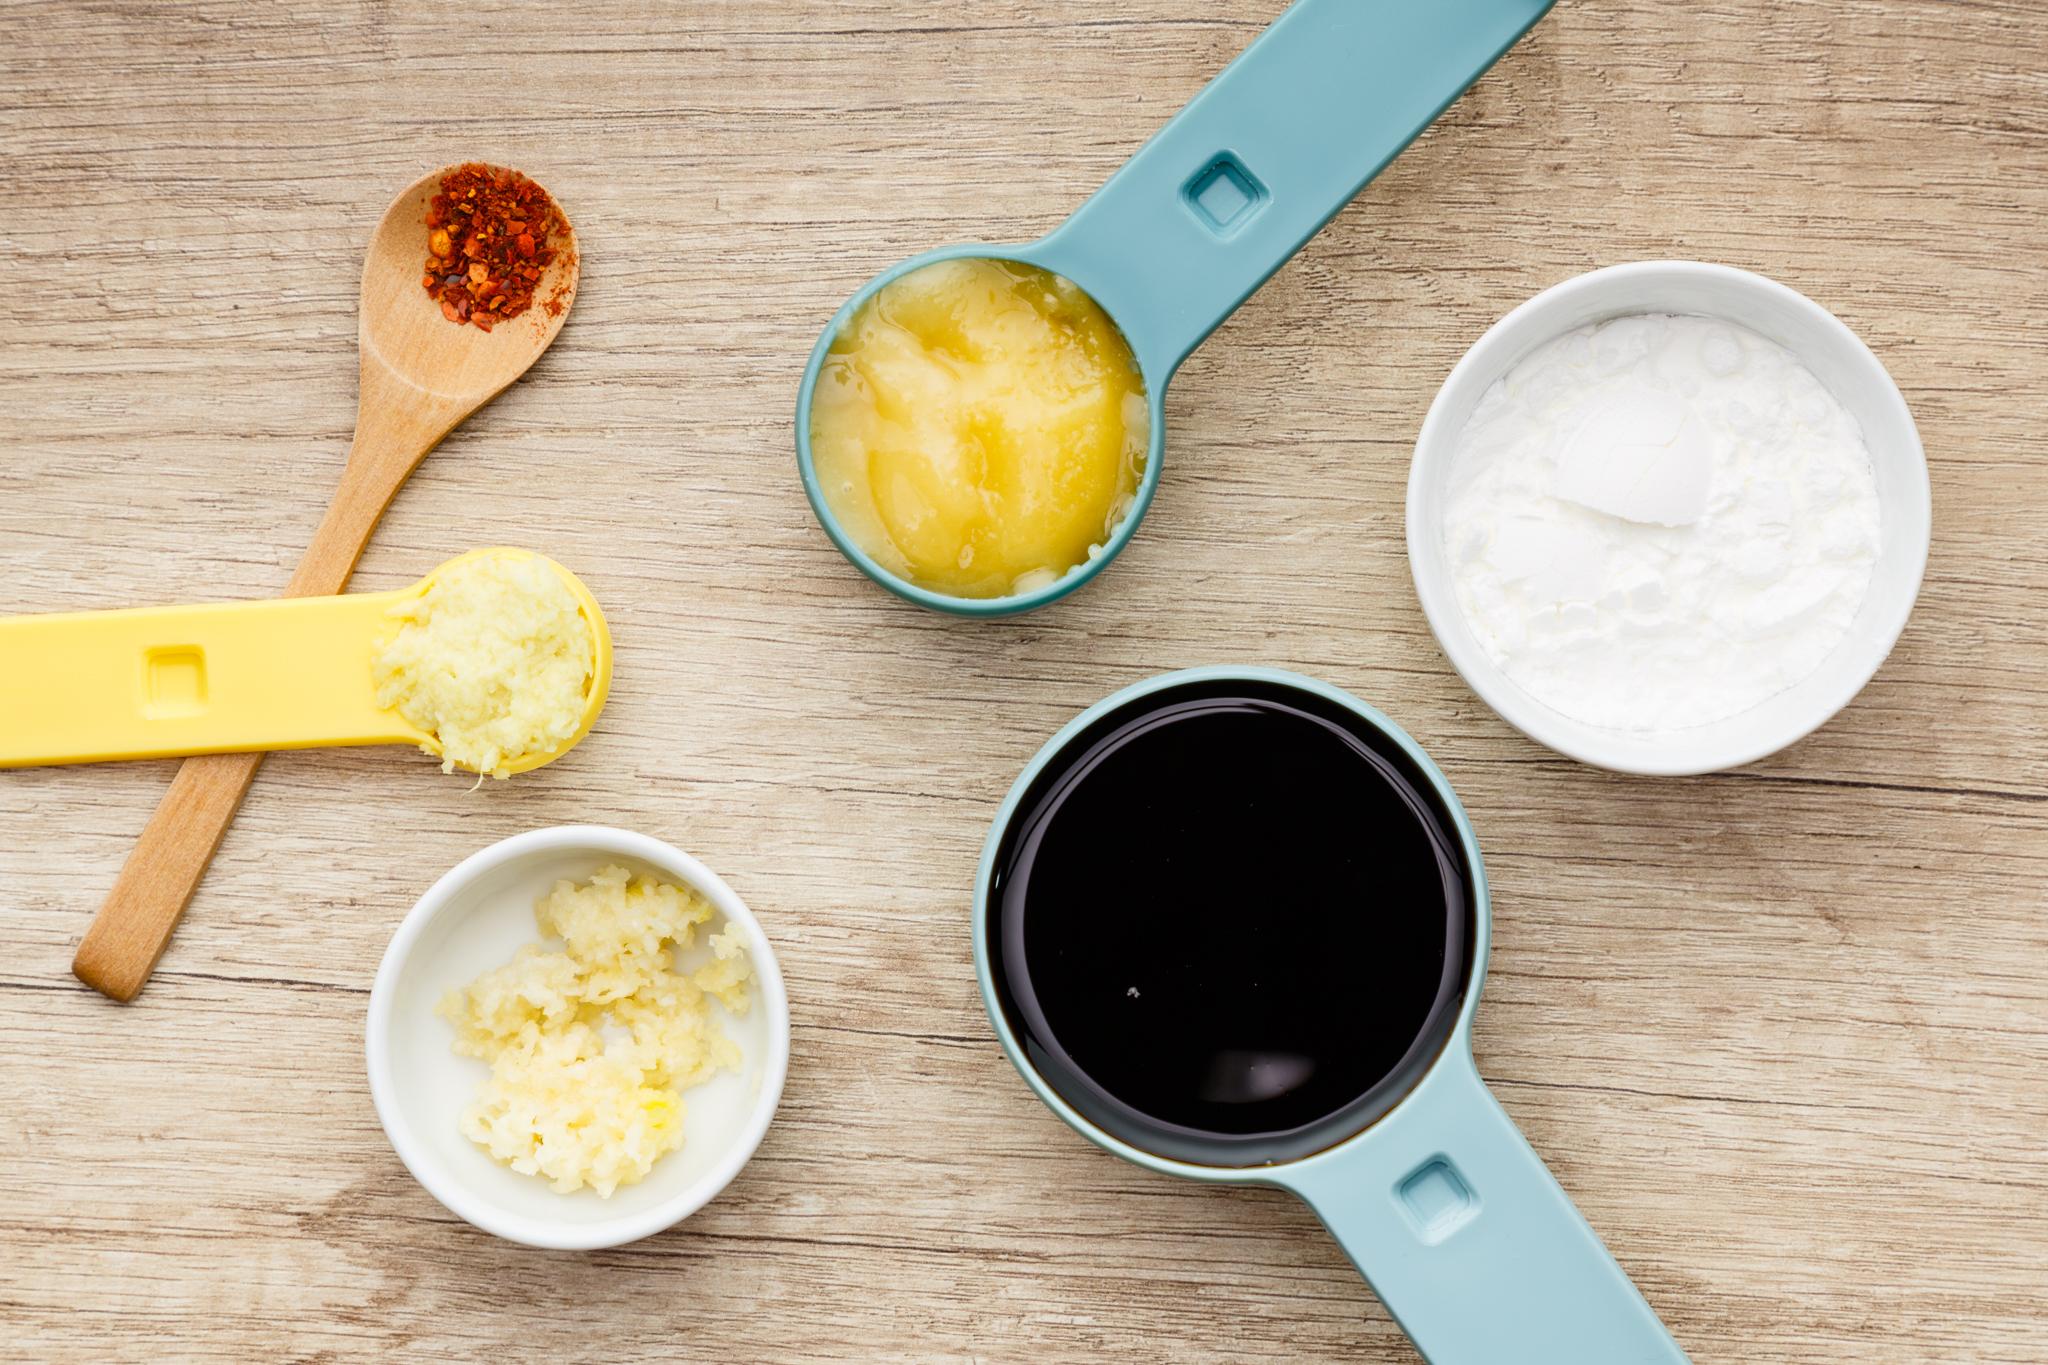 2a-paleo-teriyaki-sauce-ingredients